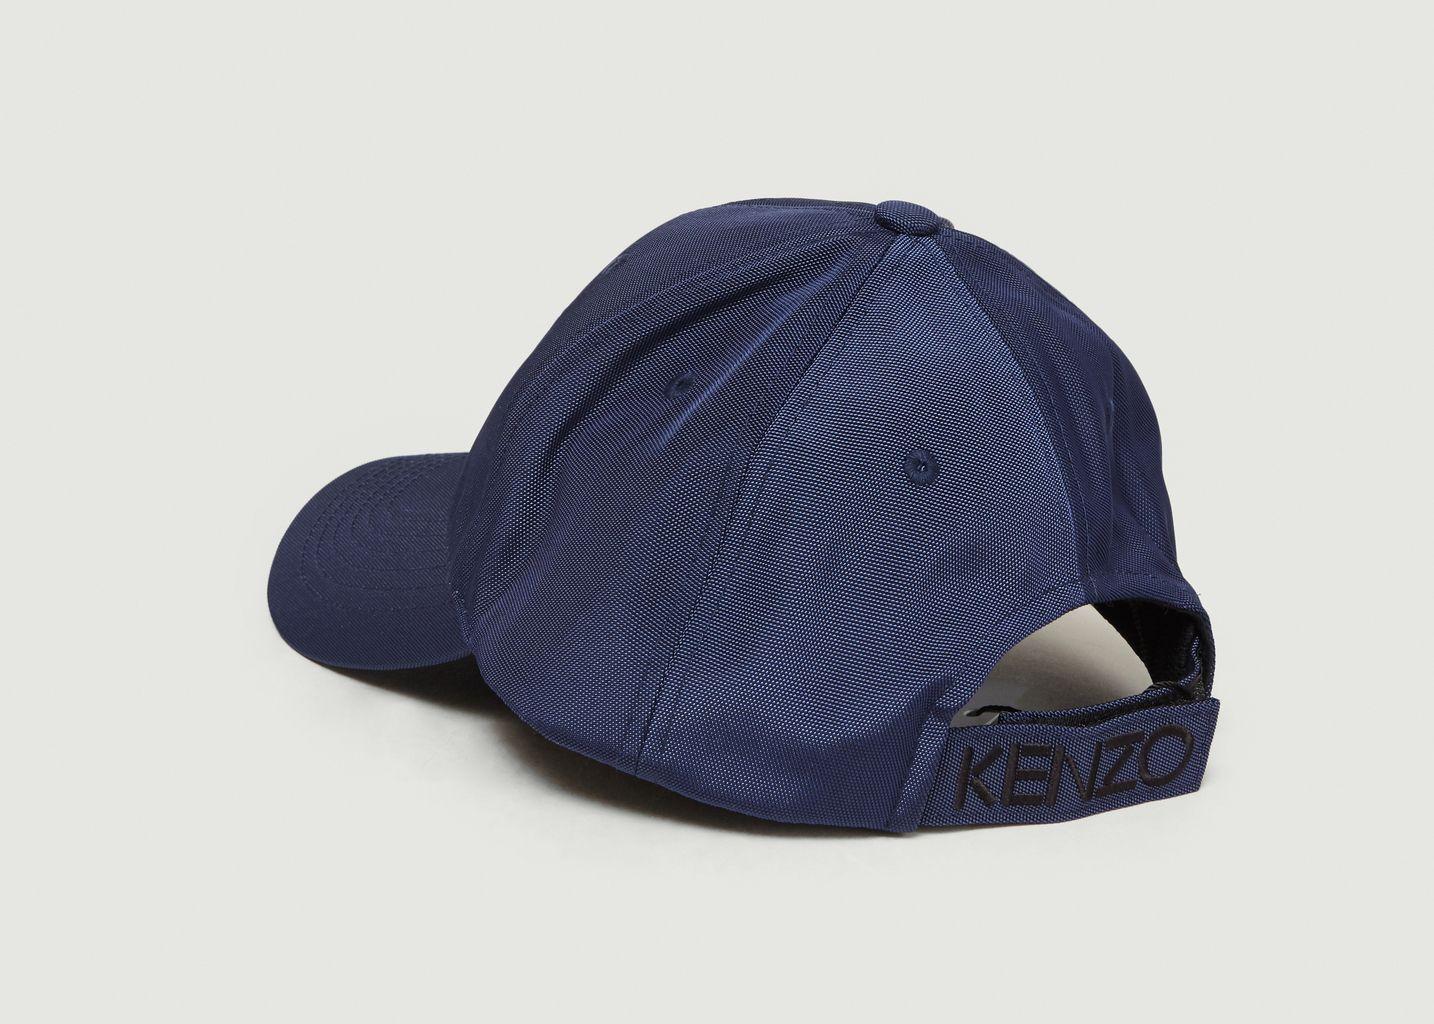 Casquette Tigre Bleu Marine Kenzo   L Exception 7eceaa0dddc